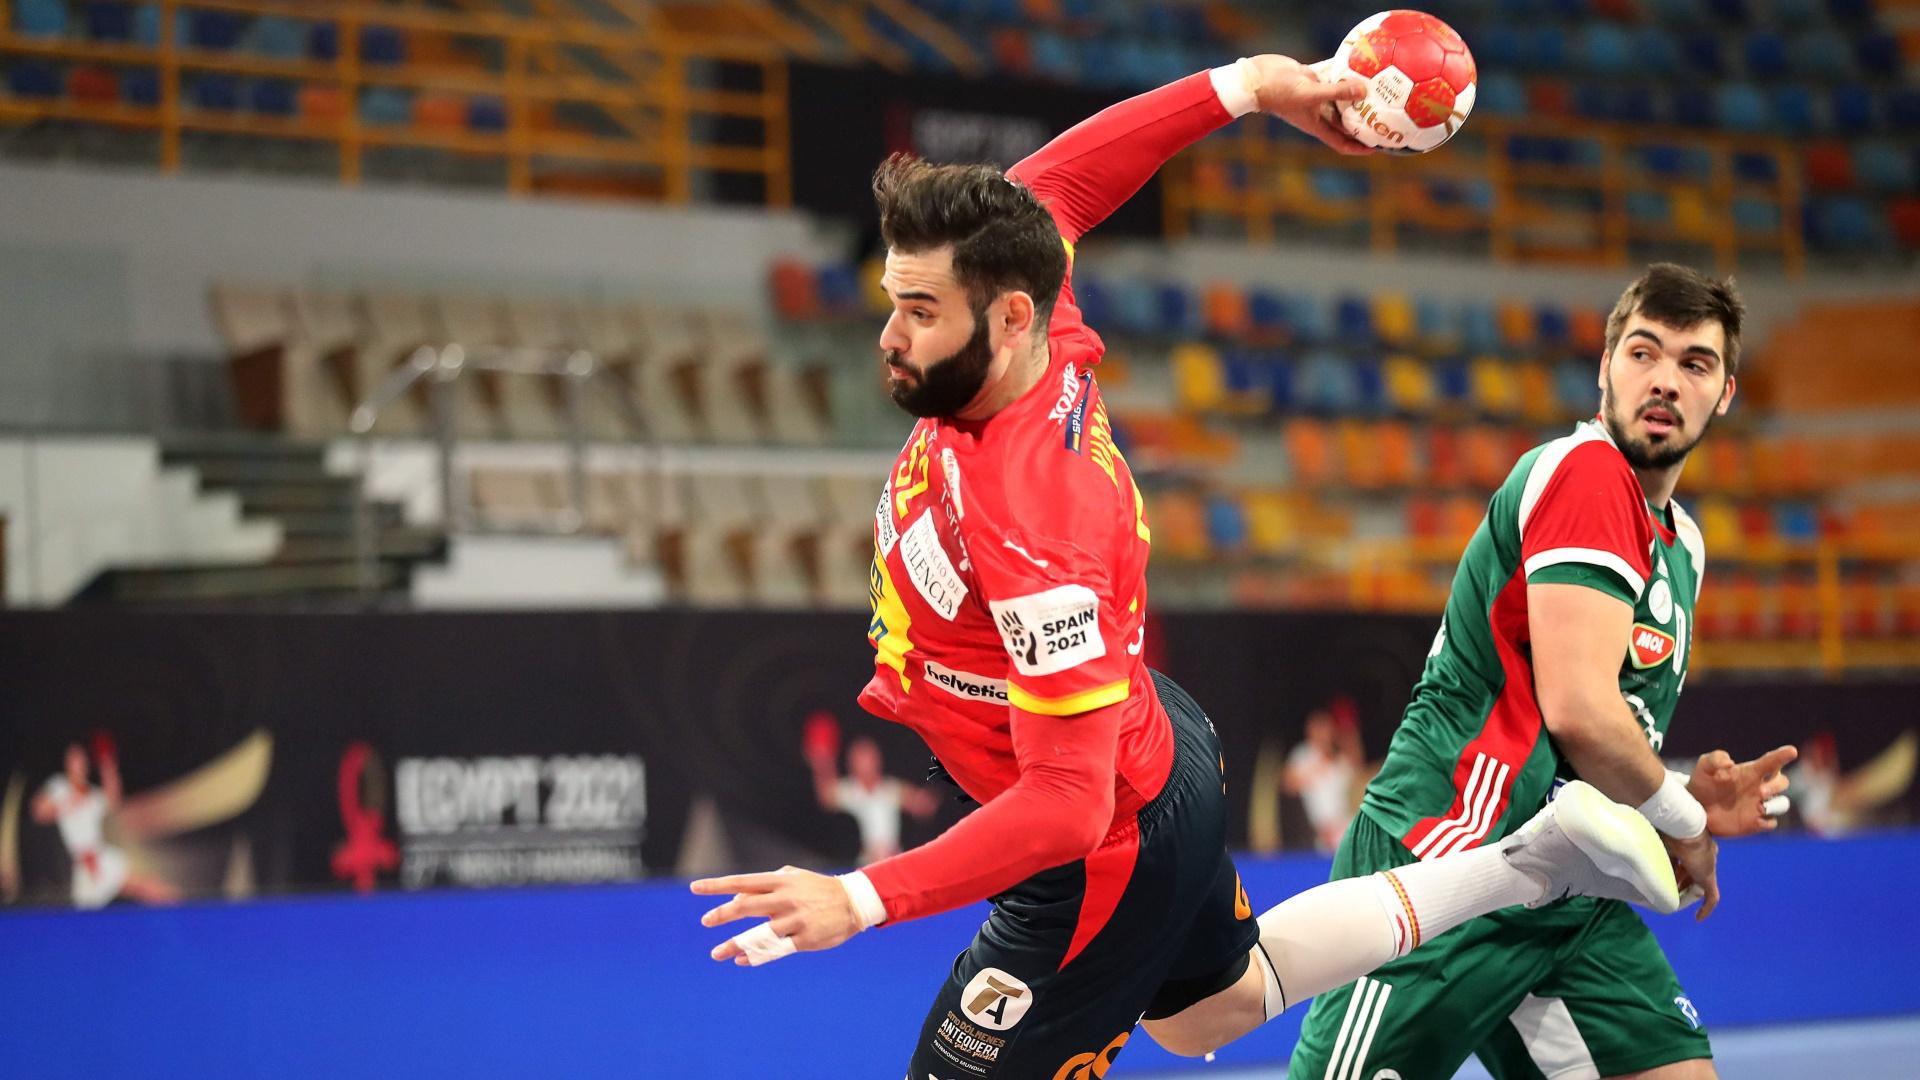 Campeonato del Mundo masculino. 2ª fase: España - Hungría